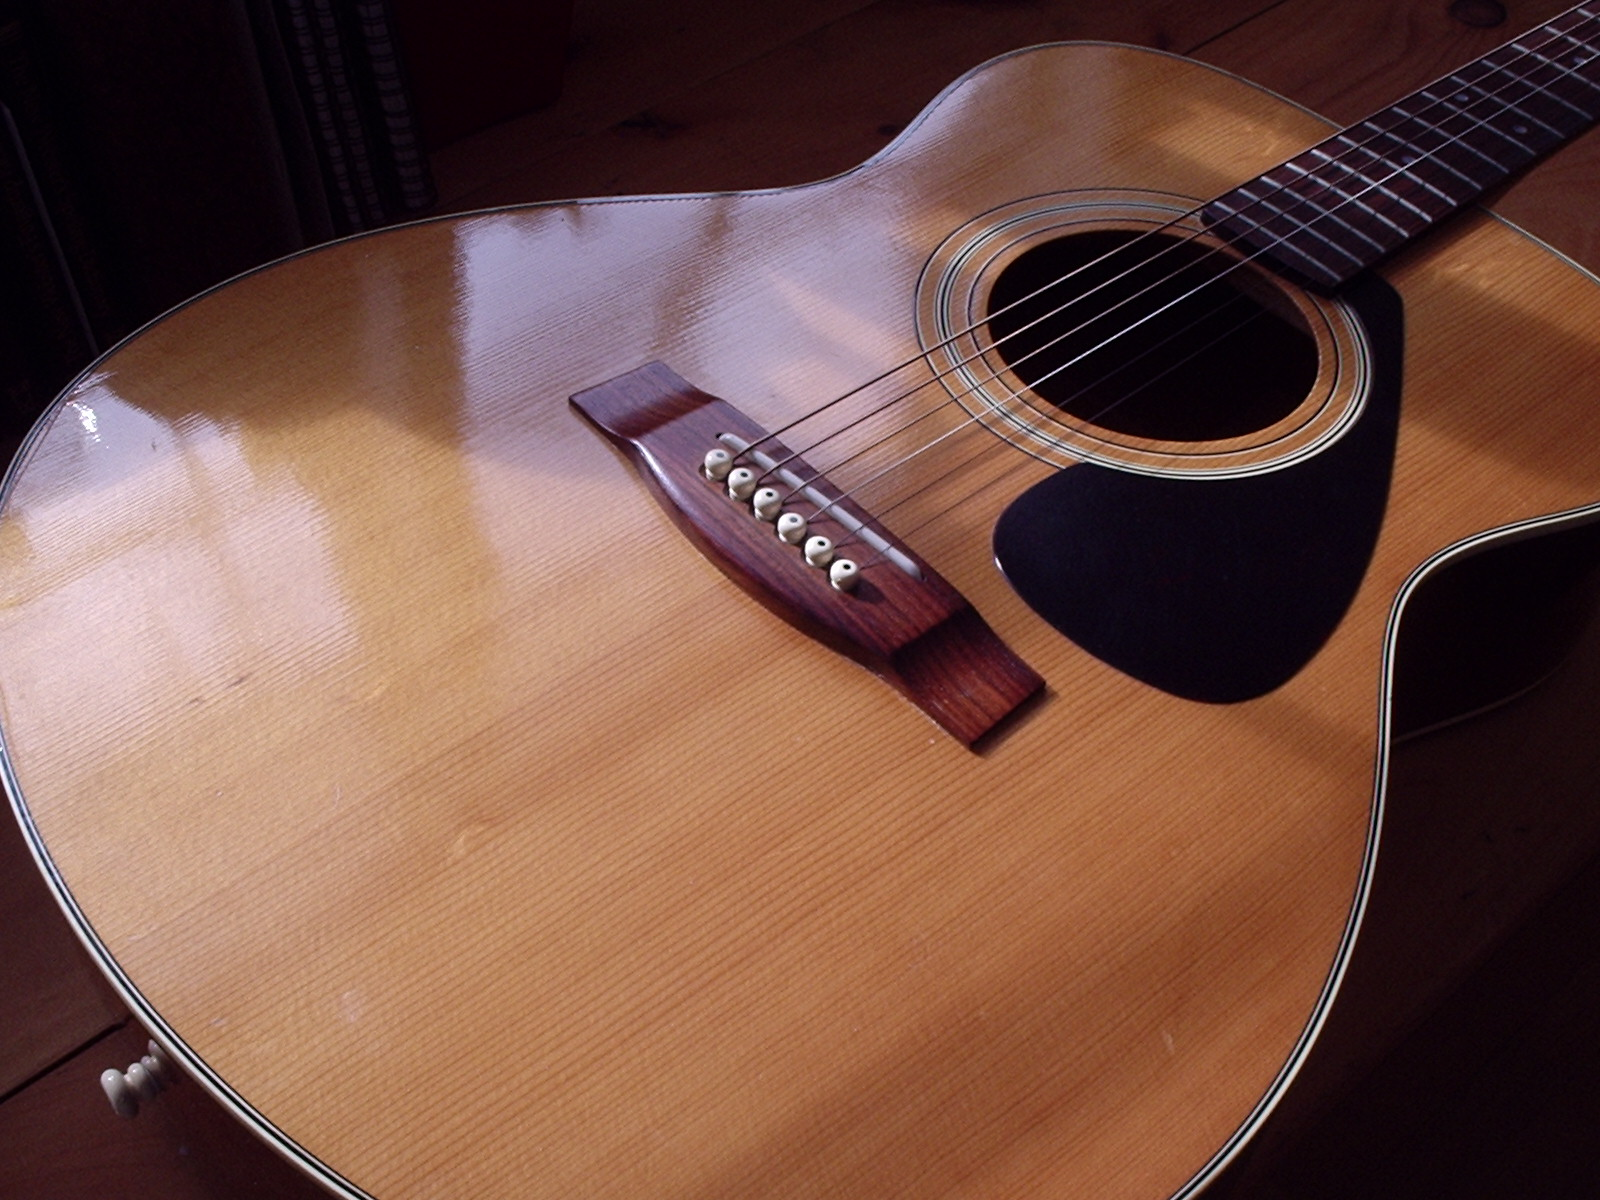 best acoustic guitar strings guitar strings review. Black Bedroom Furniture Sets. Home Design Ideas